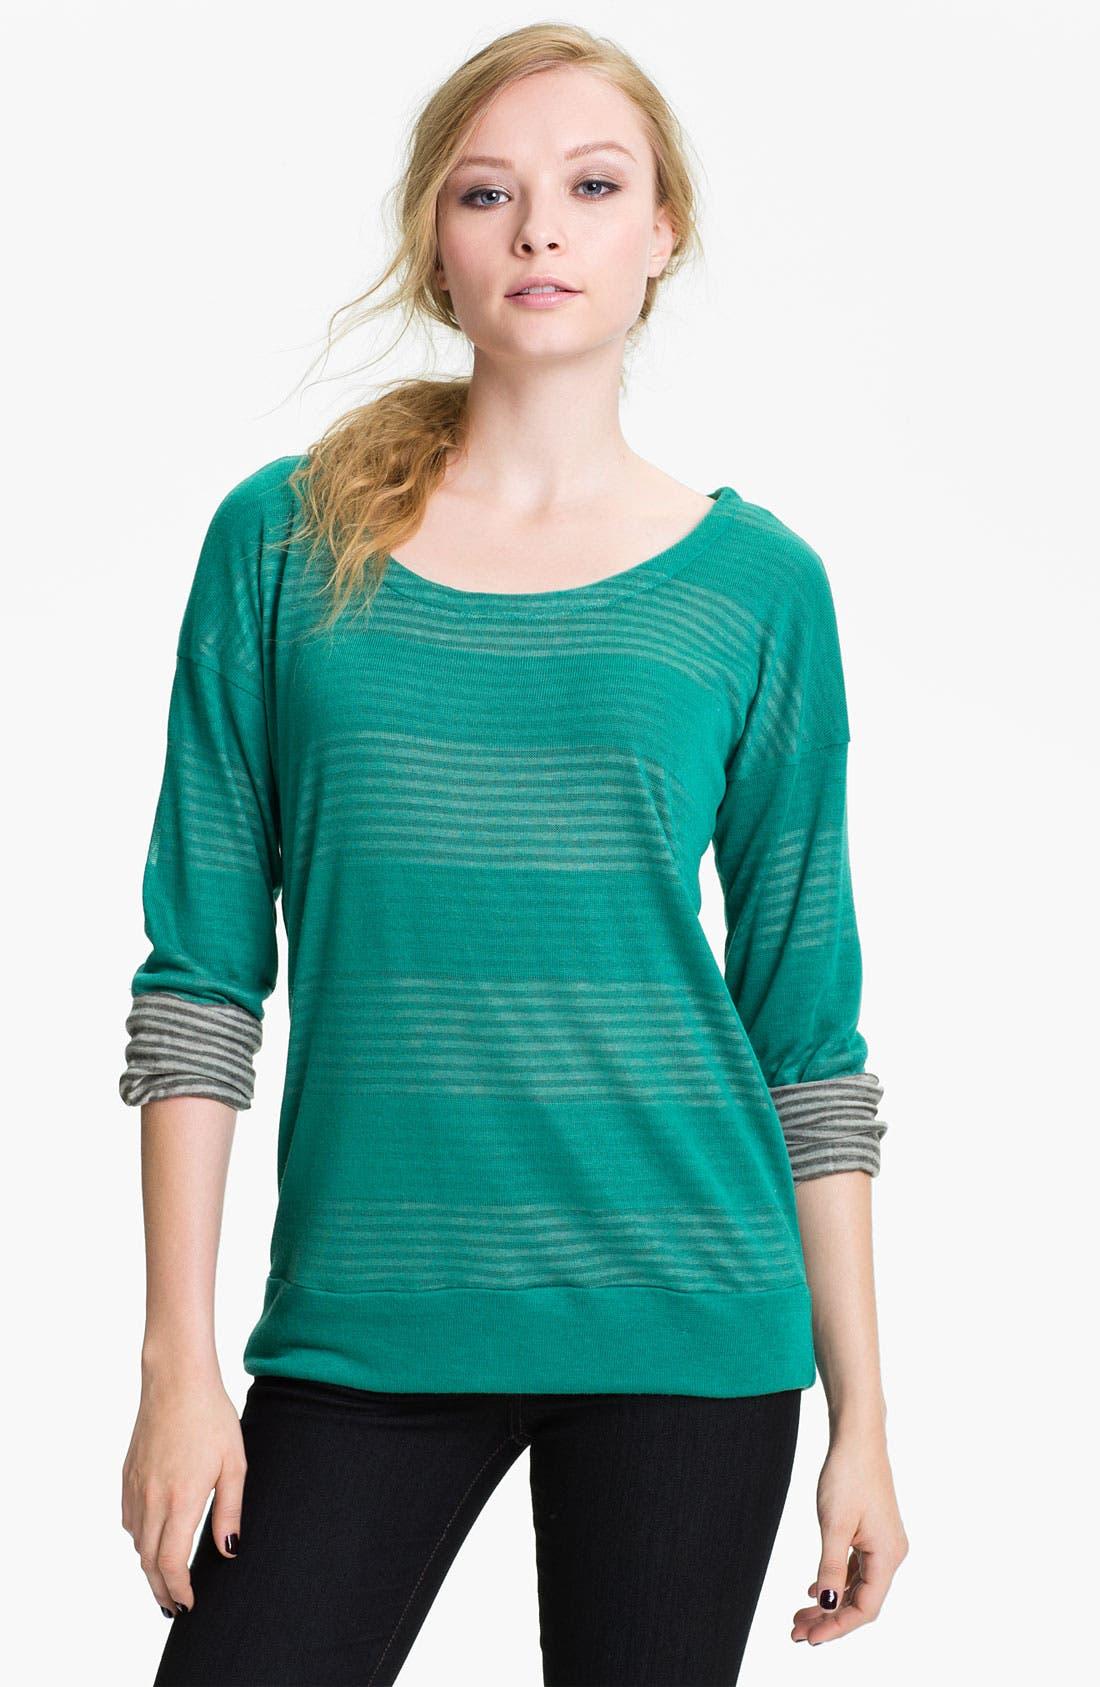 Main Image - Splendid Double Knit Stripe Top